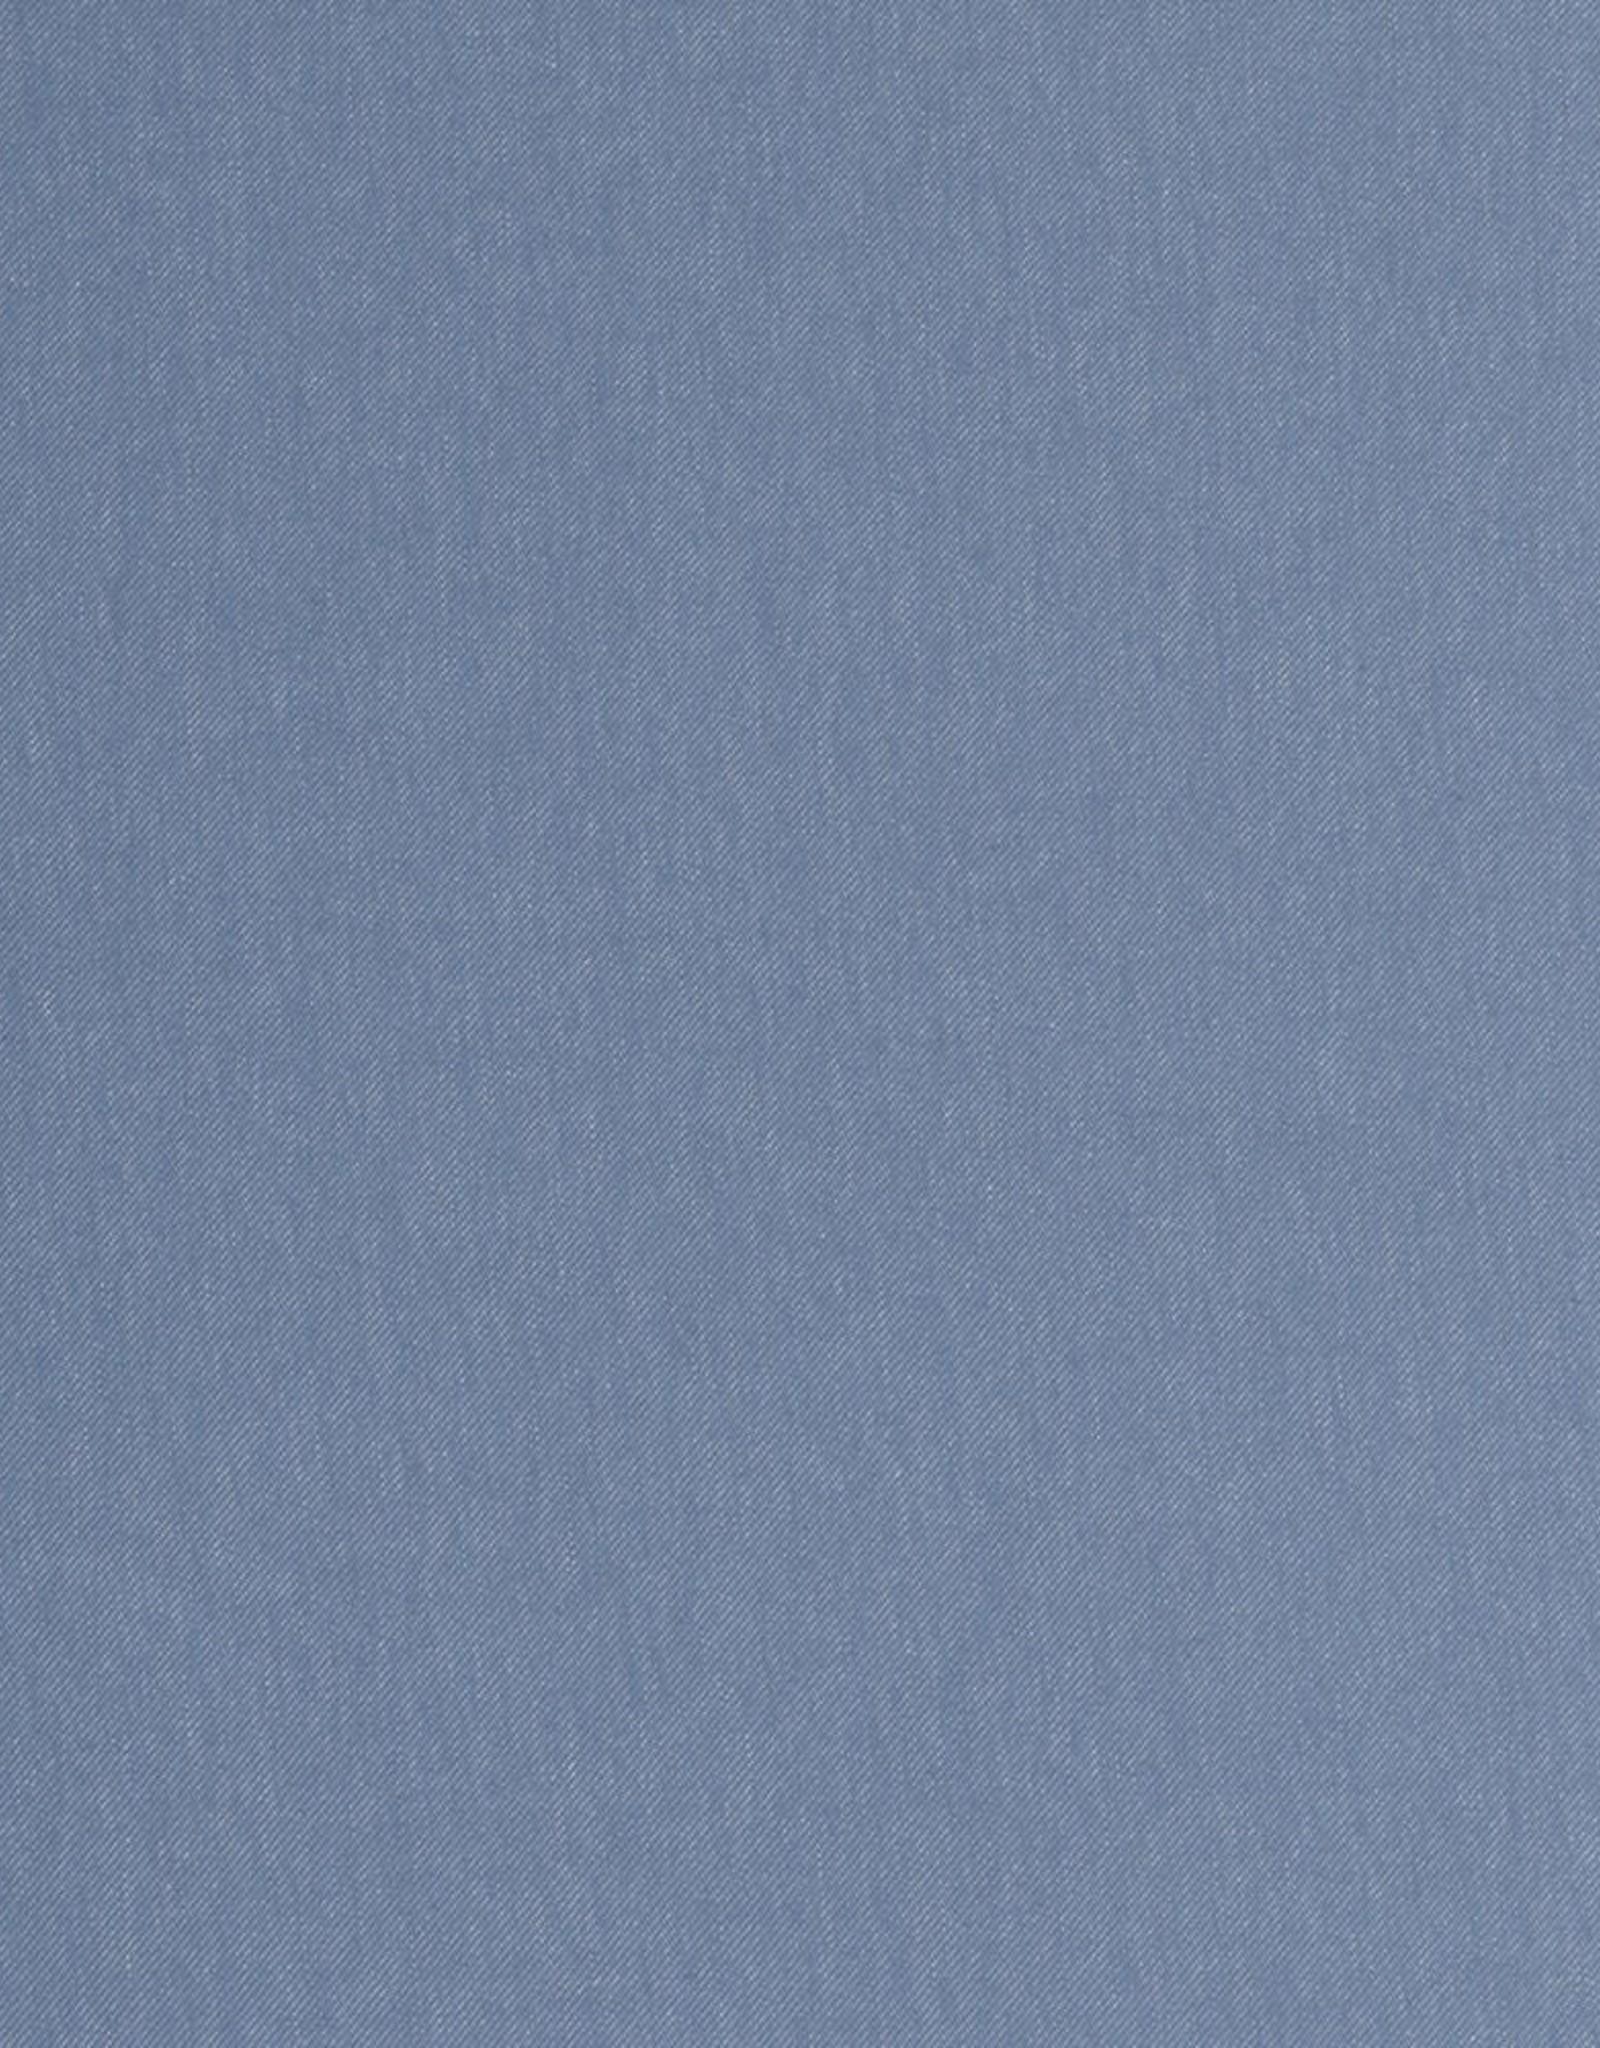 Tricot katoen jeans licht blauw grijs